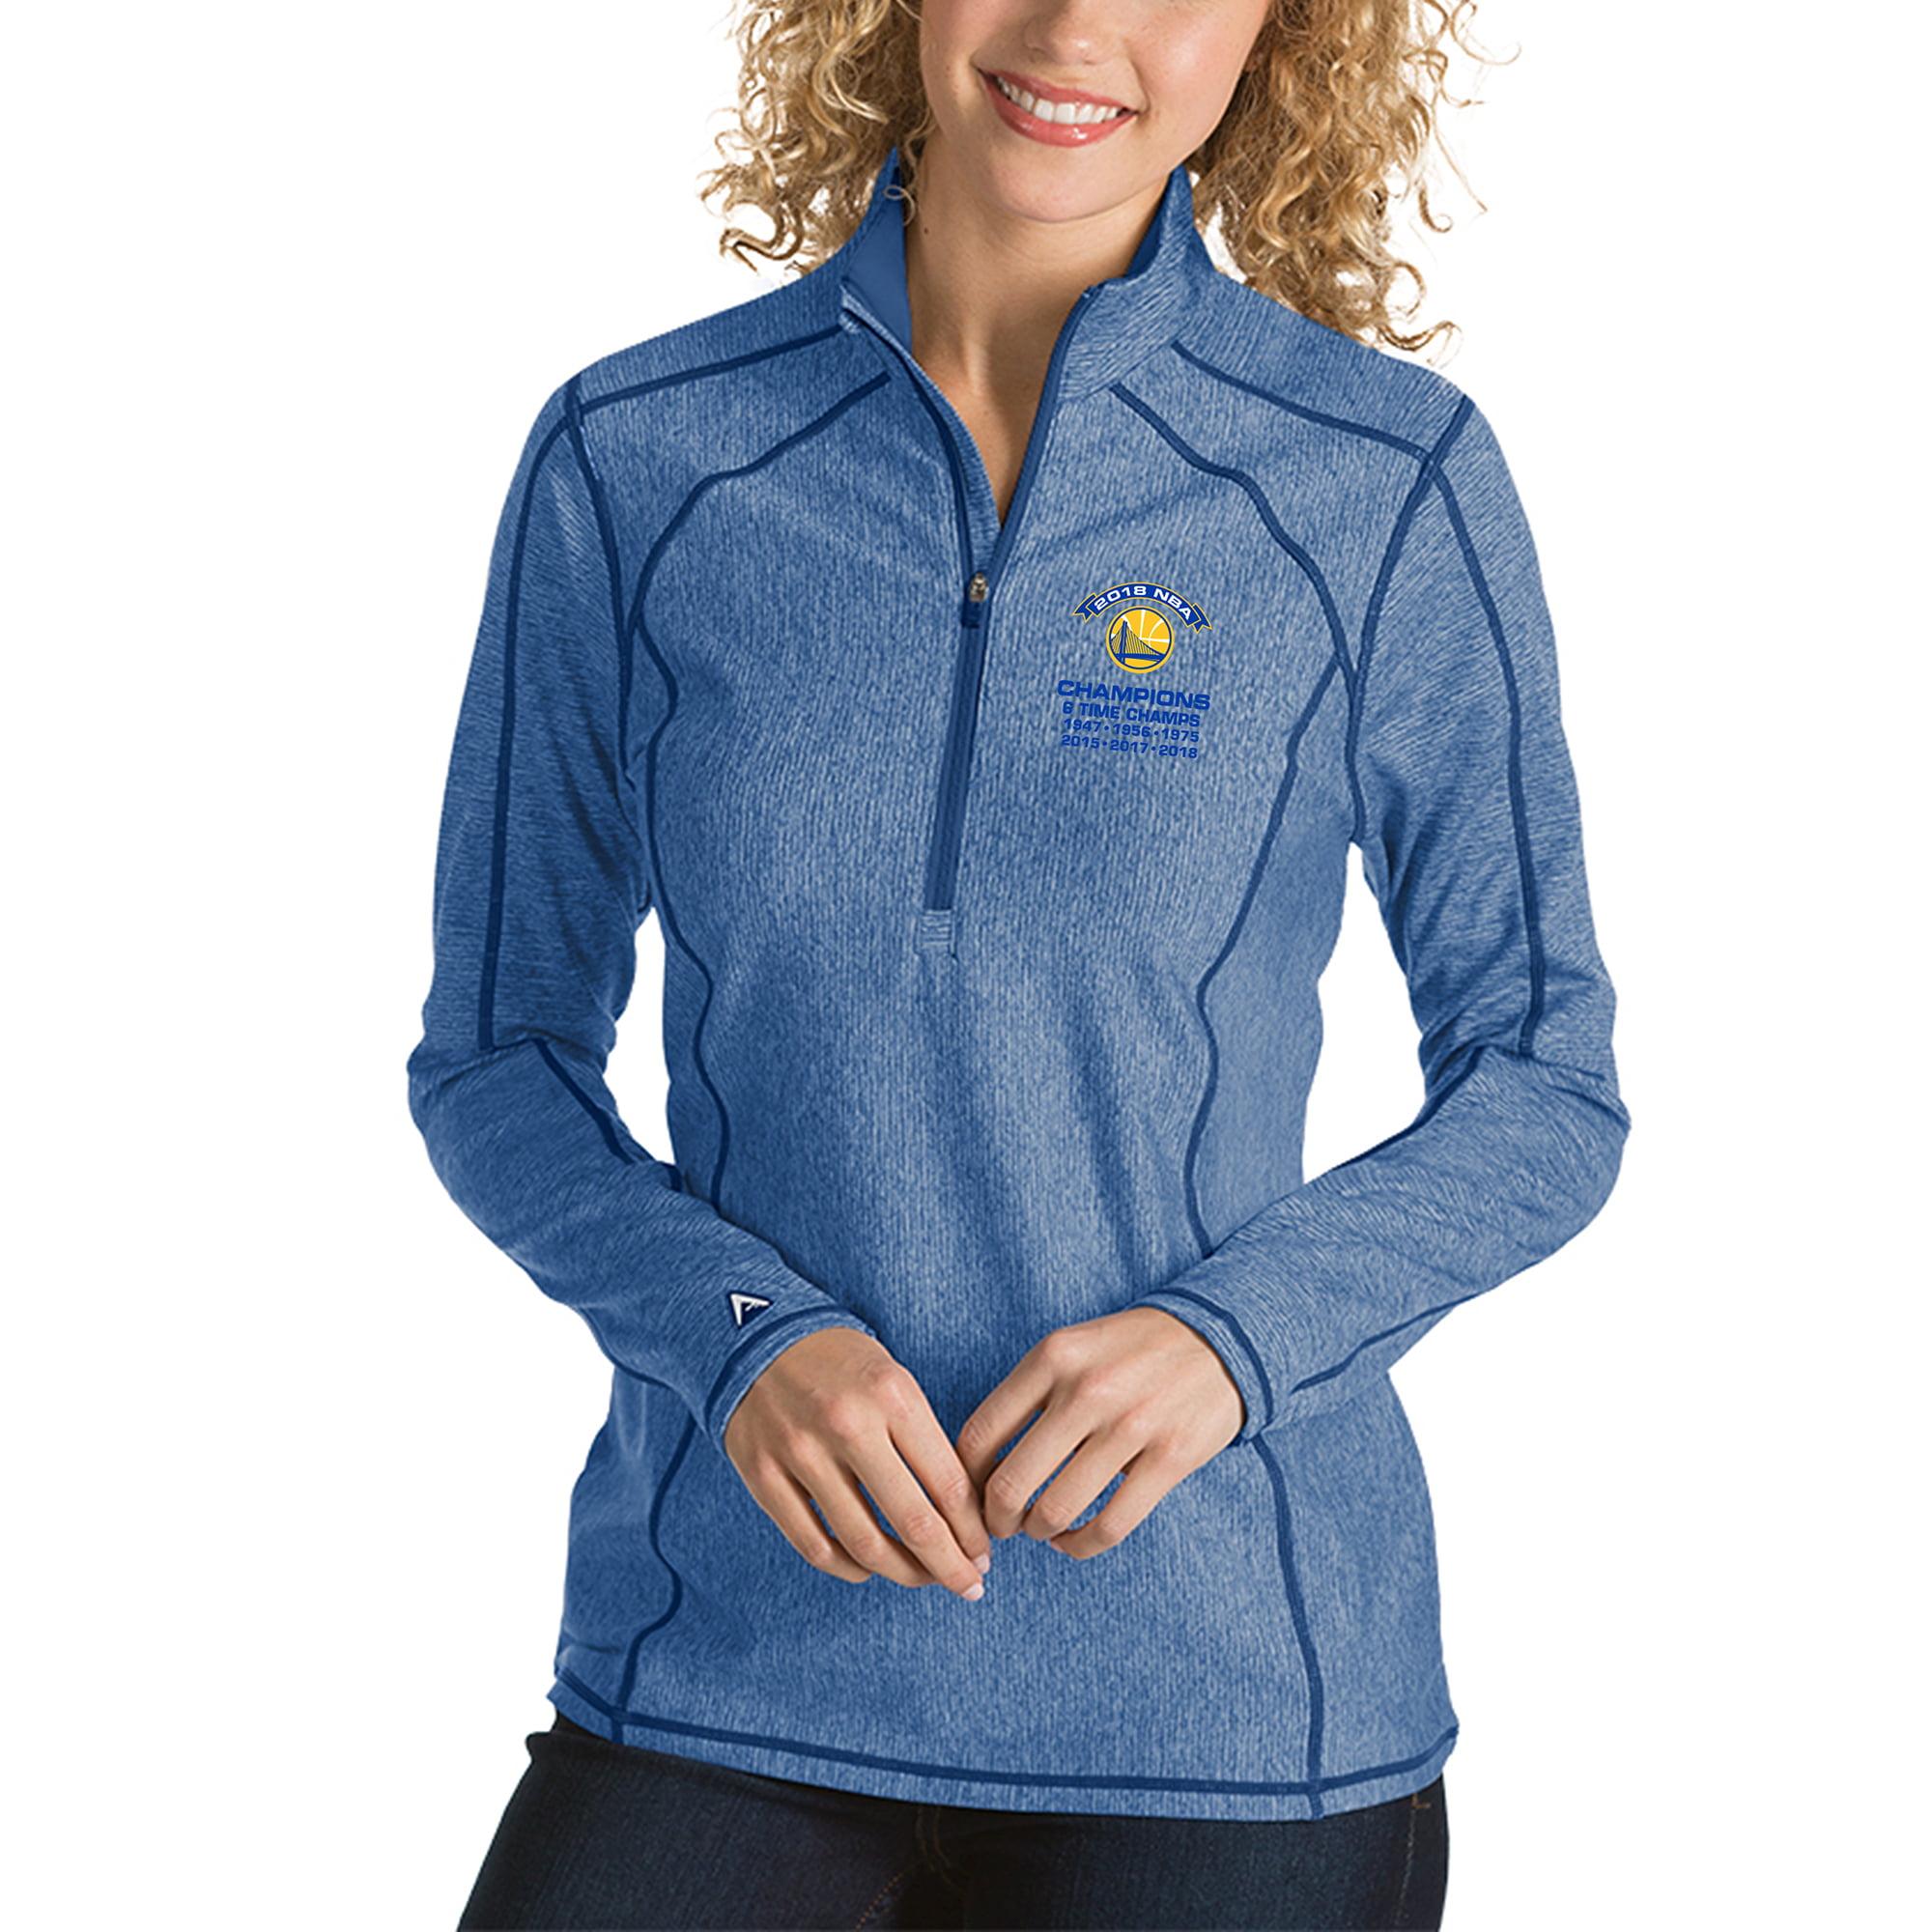 Golden State Warriors Antigua Women's 2018 NBA Finals Champions Tempo Quarter-Zip Pullover Jacket - Heather Royal